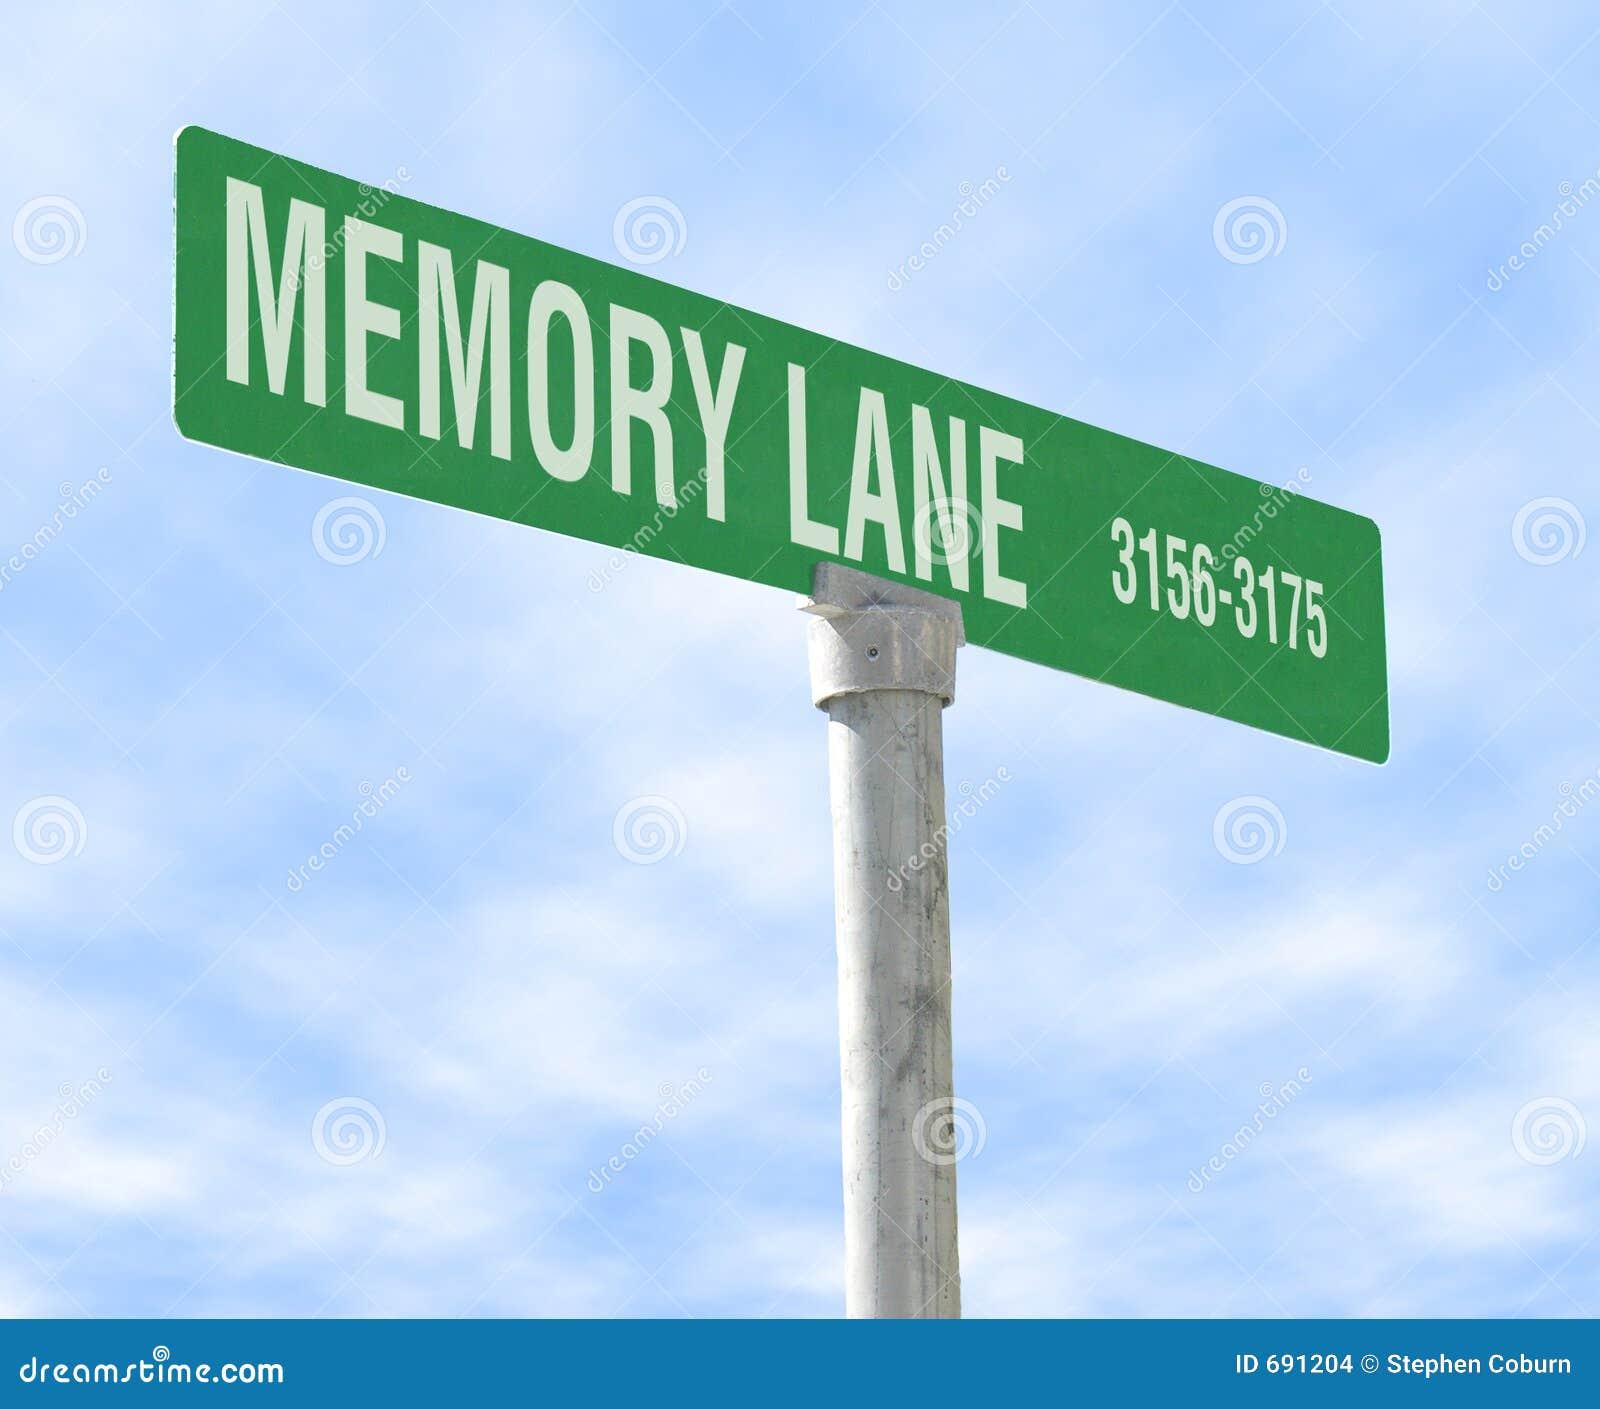 Memory Lane Classic Car Junkyard